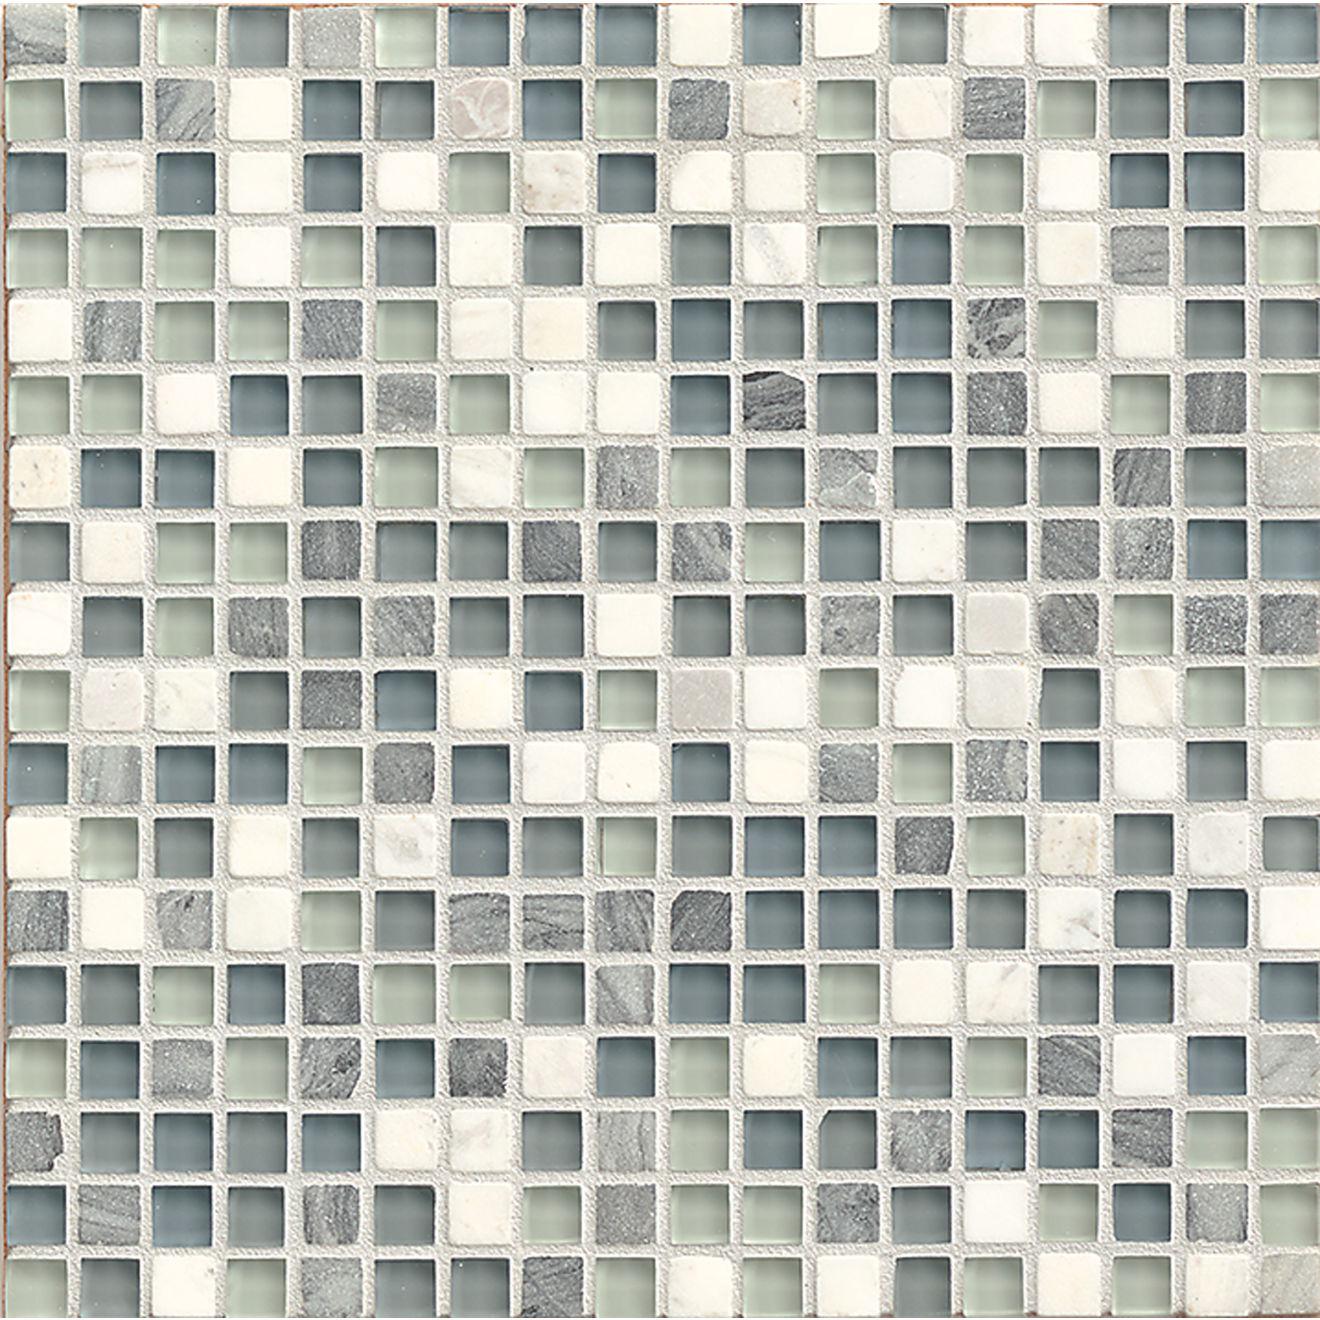 "Eclipse 5/8"" x 5/8"" Wall Mosaic in Marina"